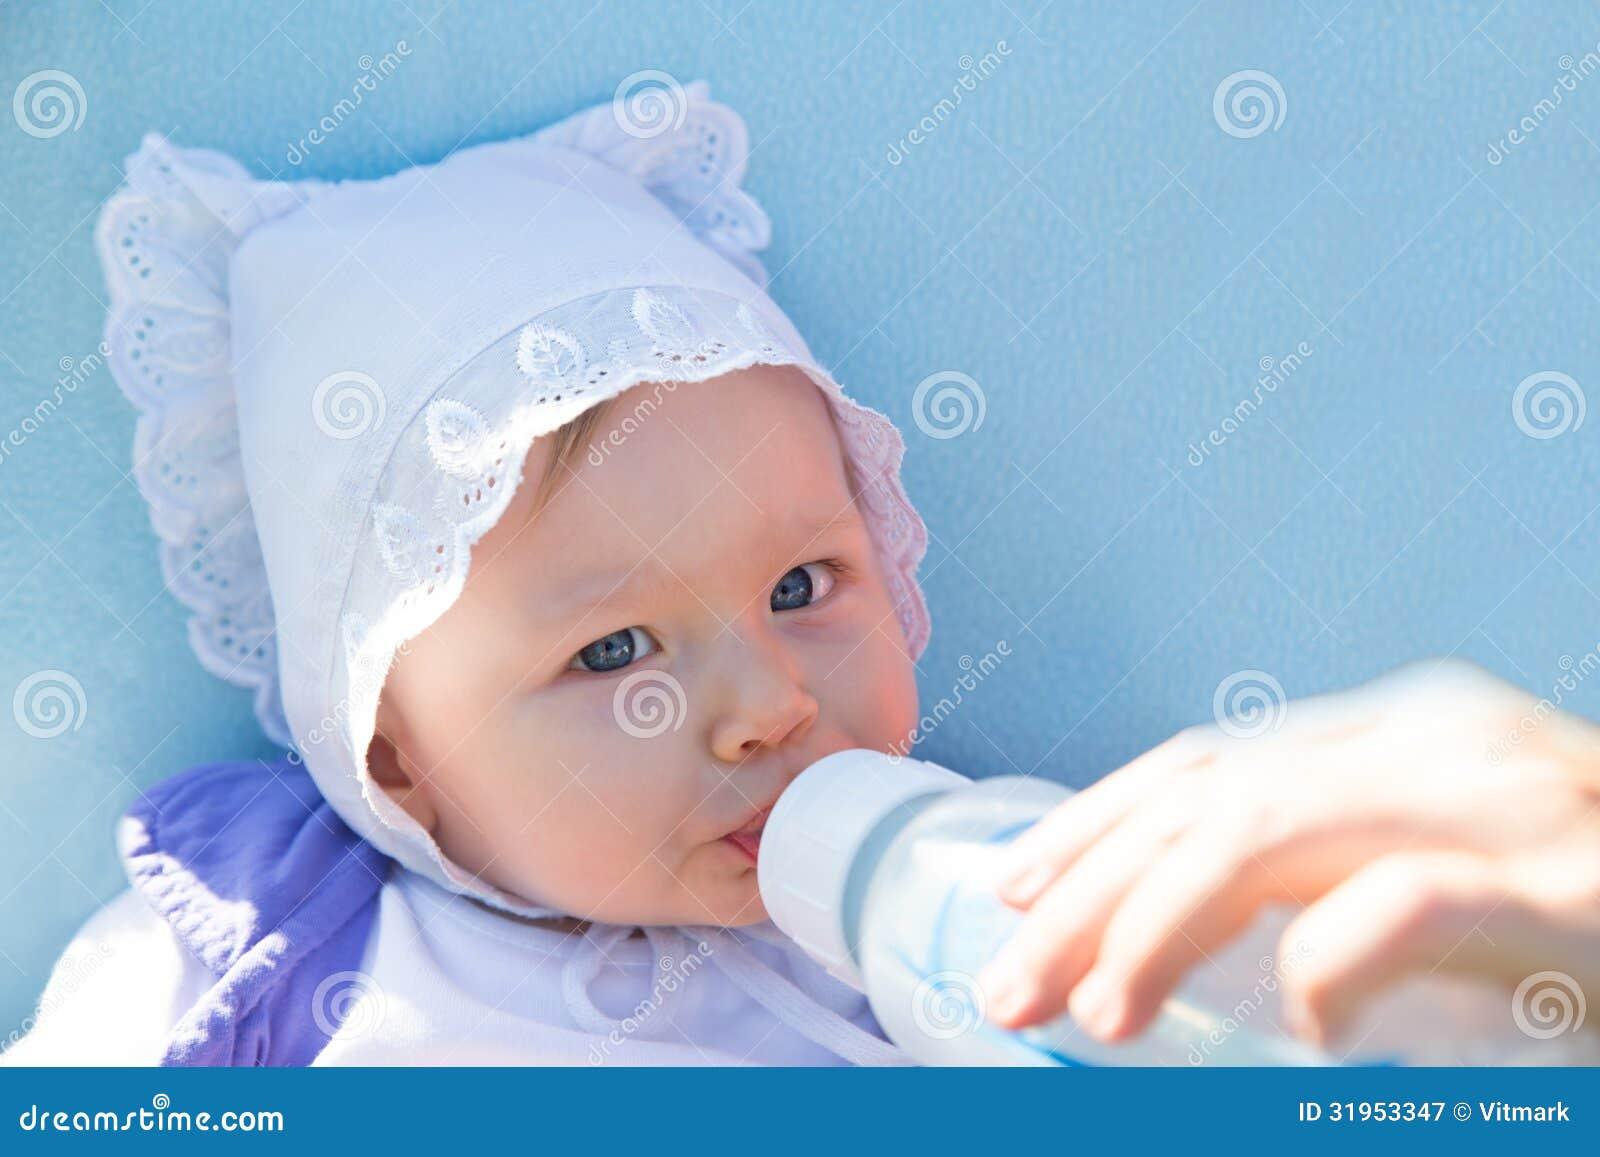 Adorable child girl with infant formula in bottle drinking milk